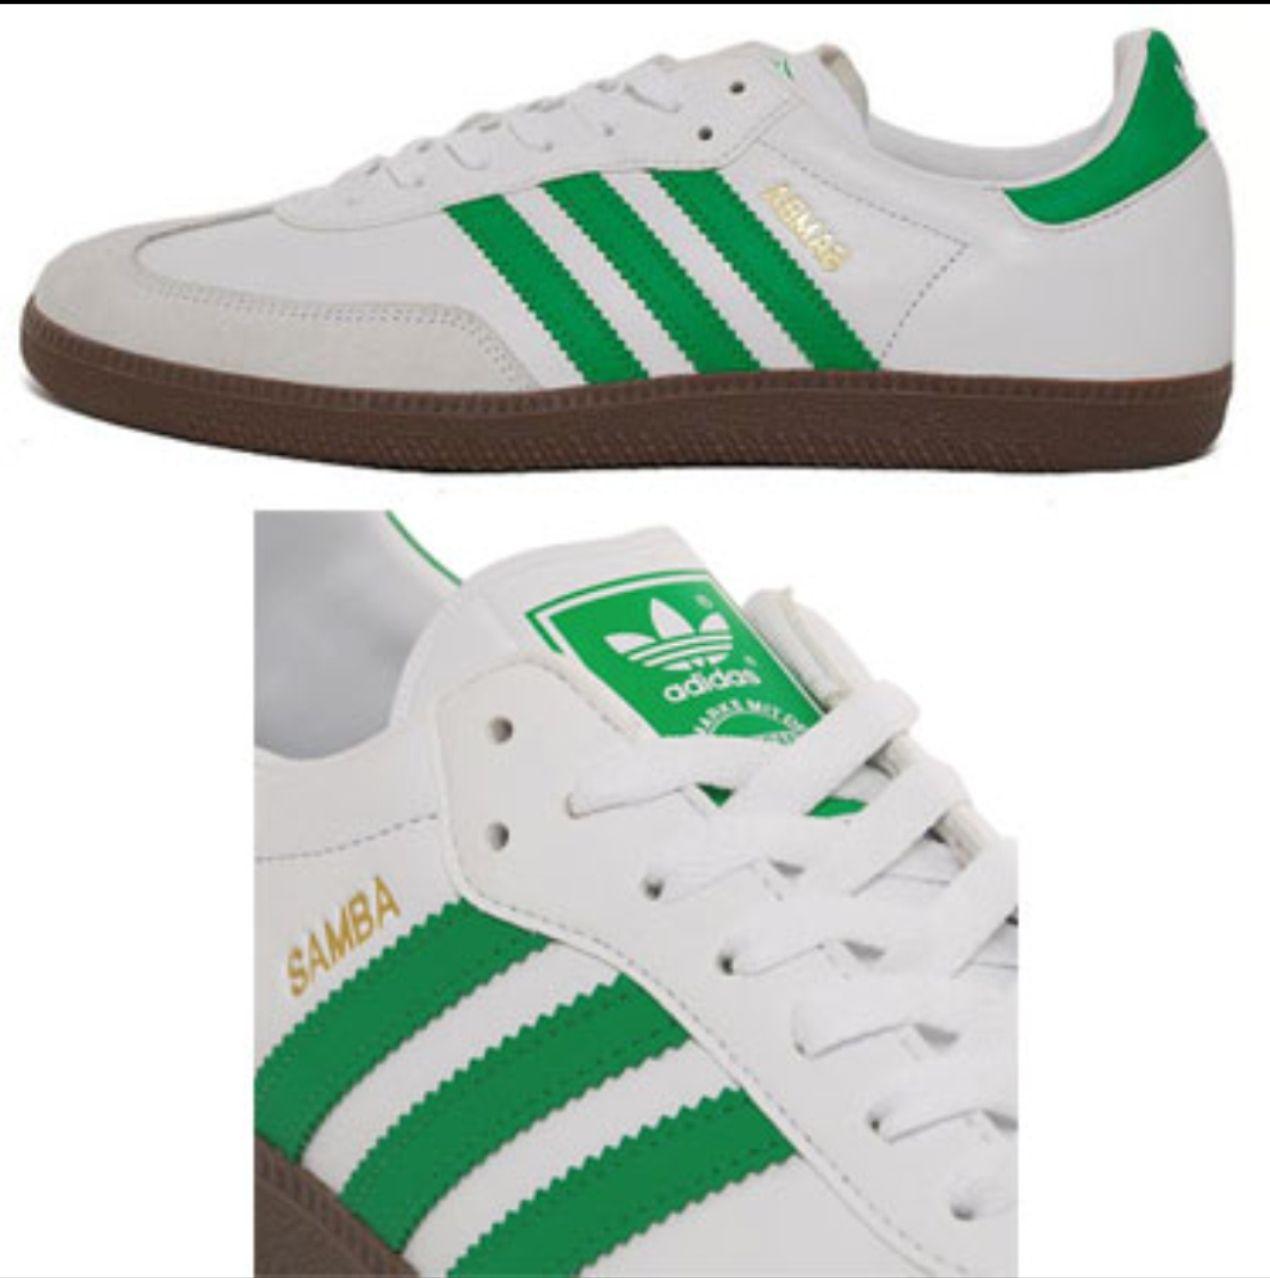 6d9ea3962 ... discount code for adidas samba sneaker white green 0e177 f16d3